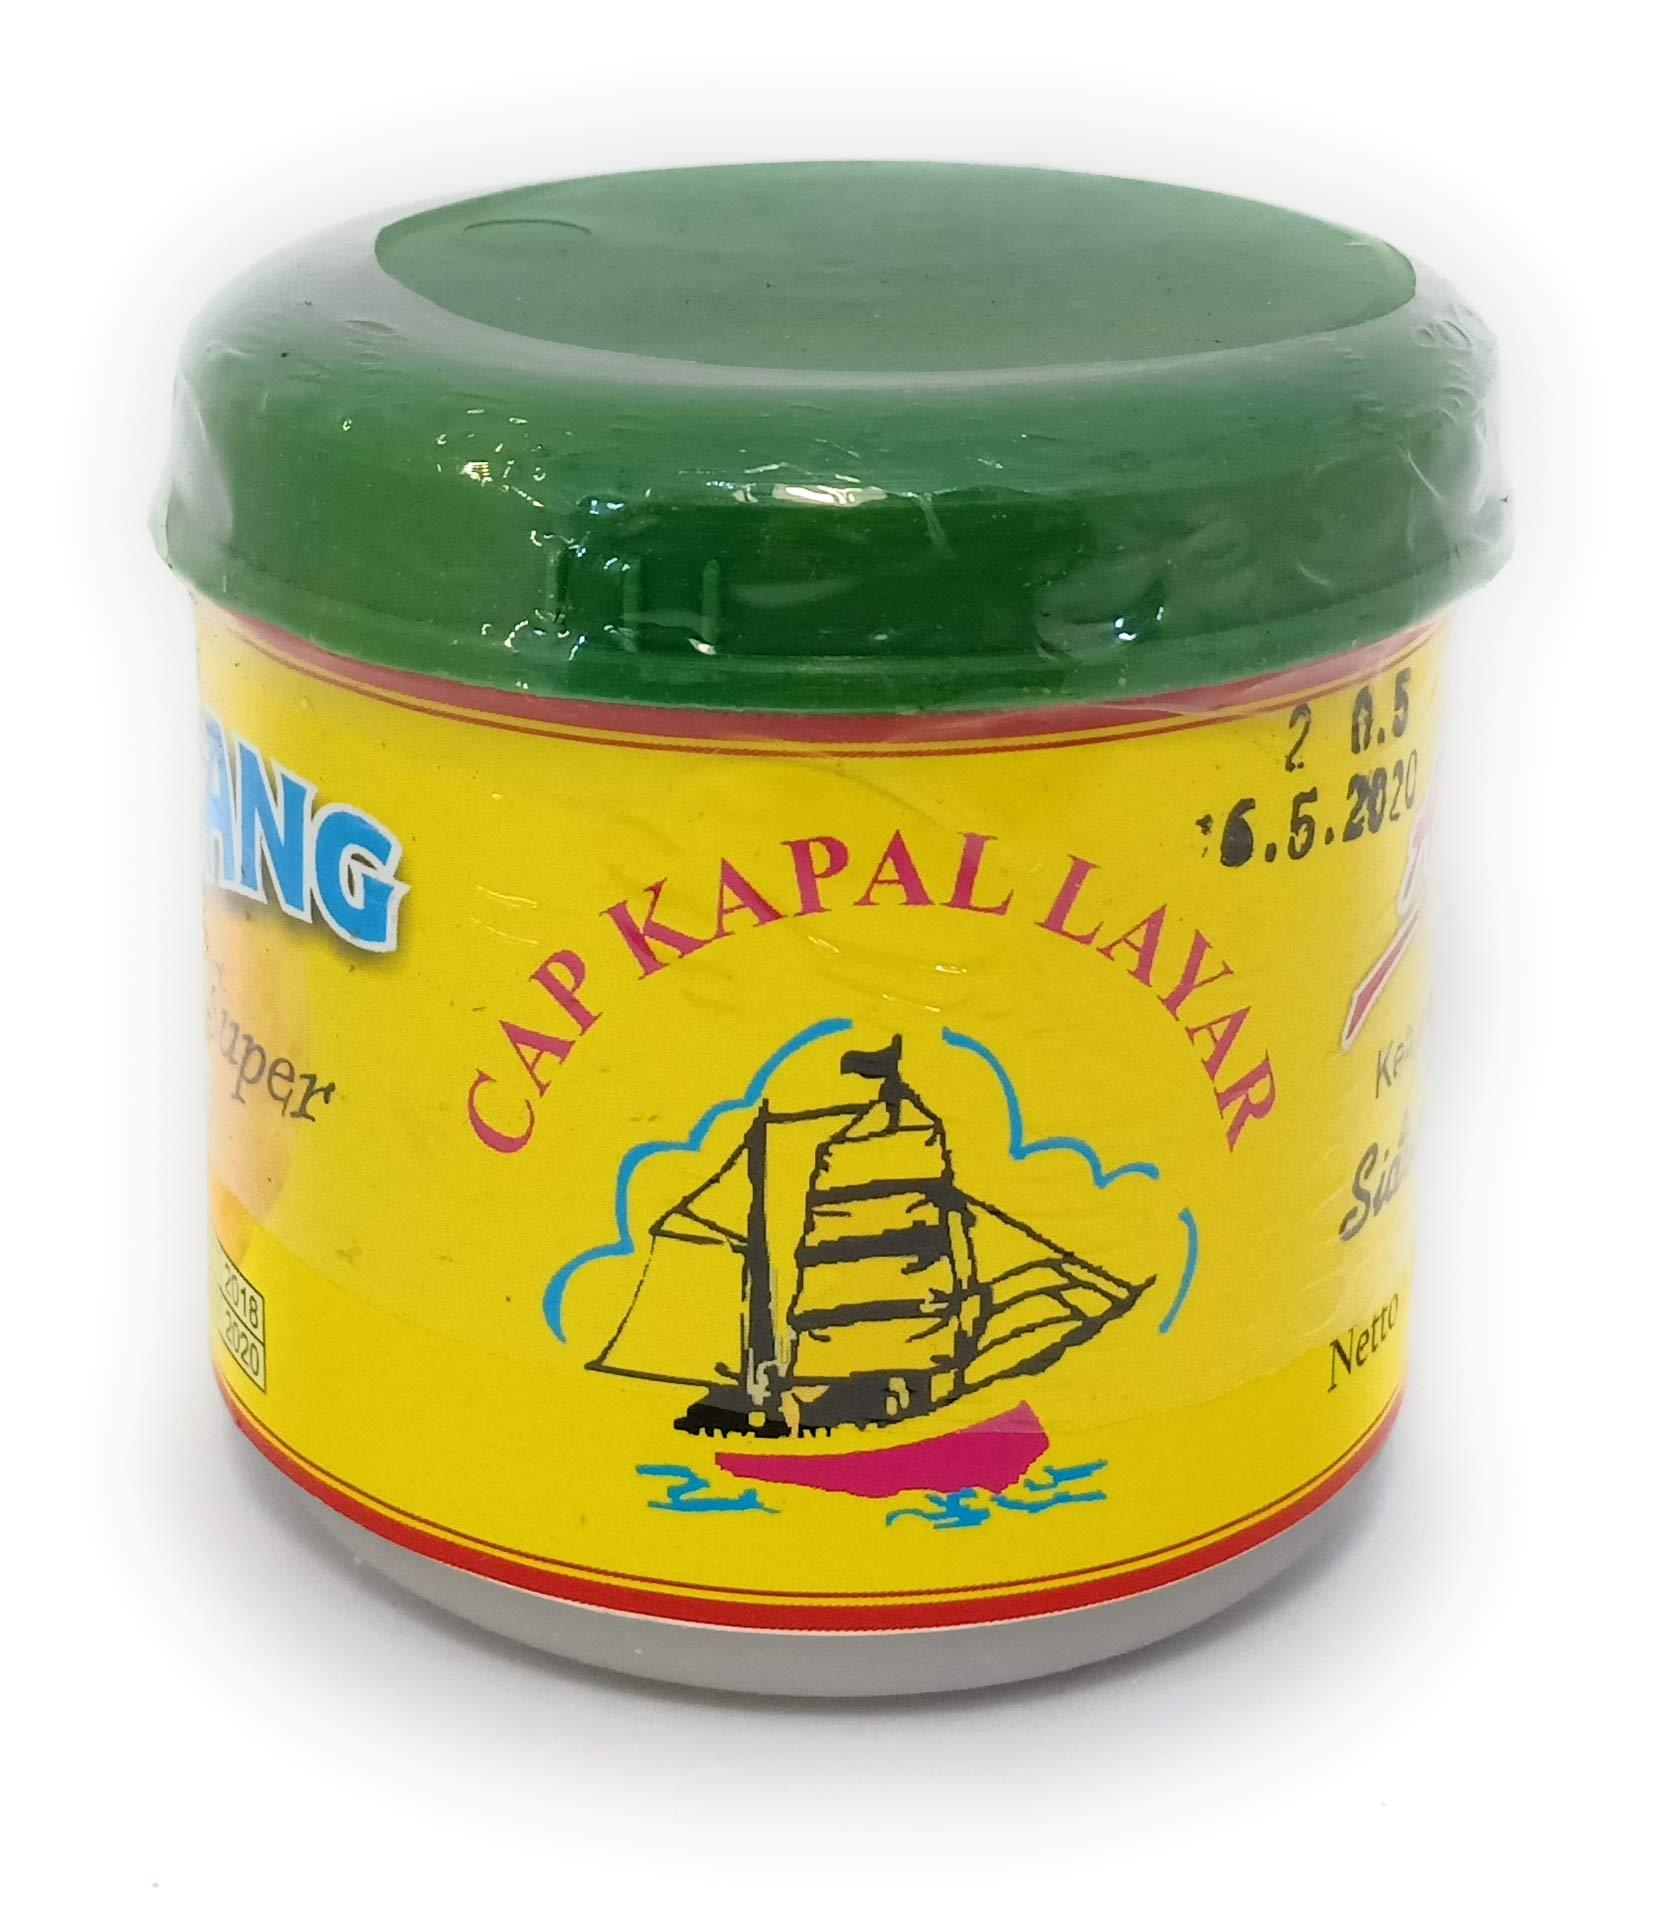 Cap Kapal Layar Petis Udang Super (Shrimp Paste), 200 Gram (Pack of 4) by Cap Kapal Layar